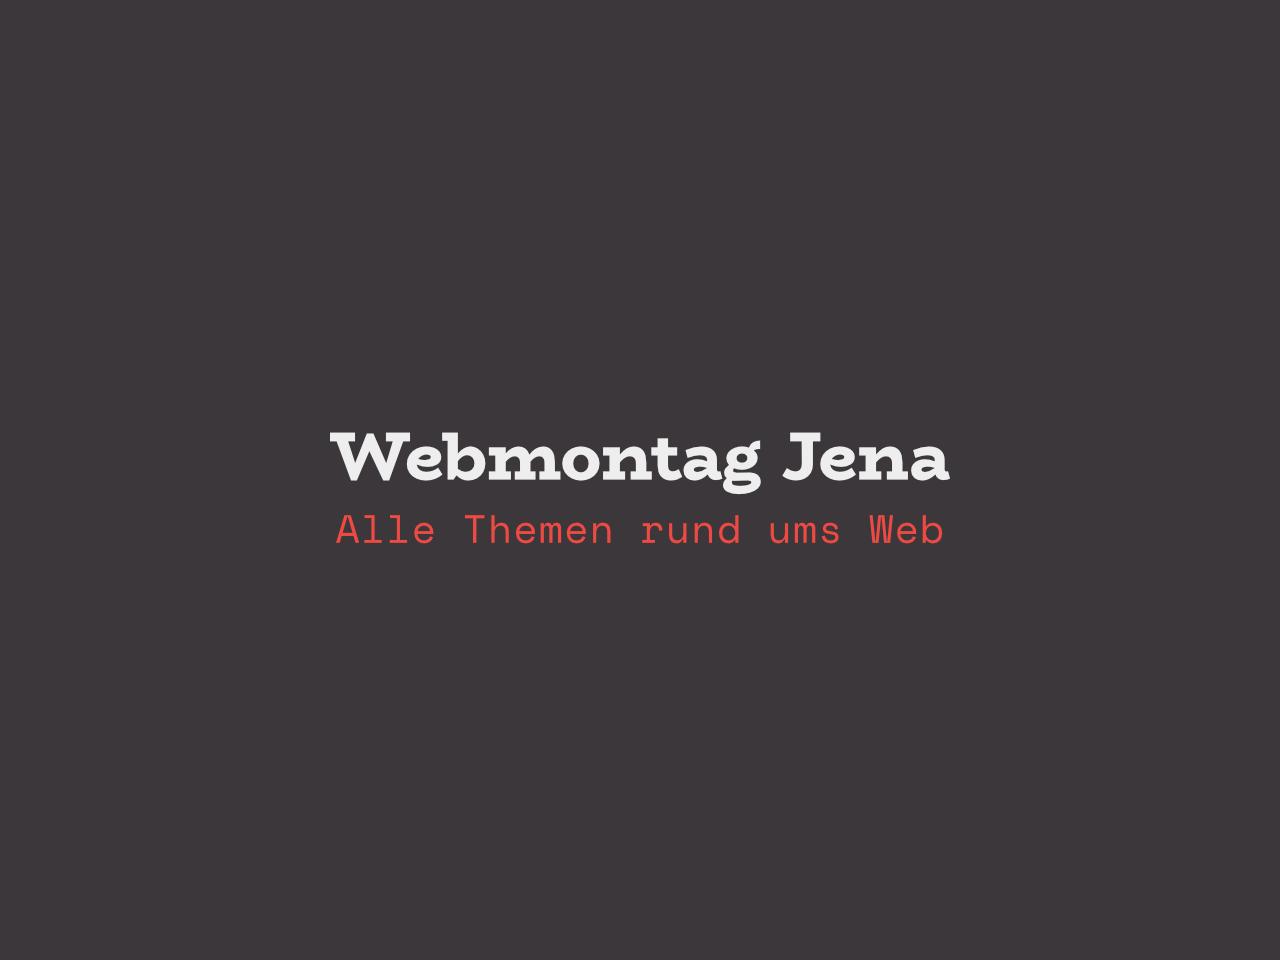 Webmontag Jena Beitragsbild